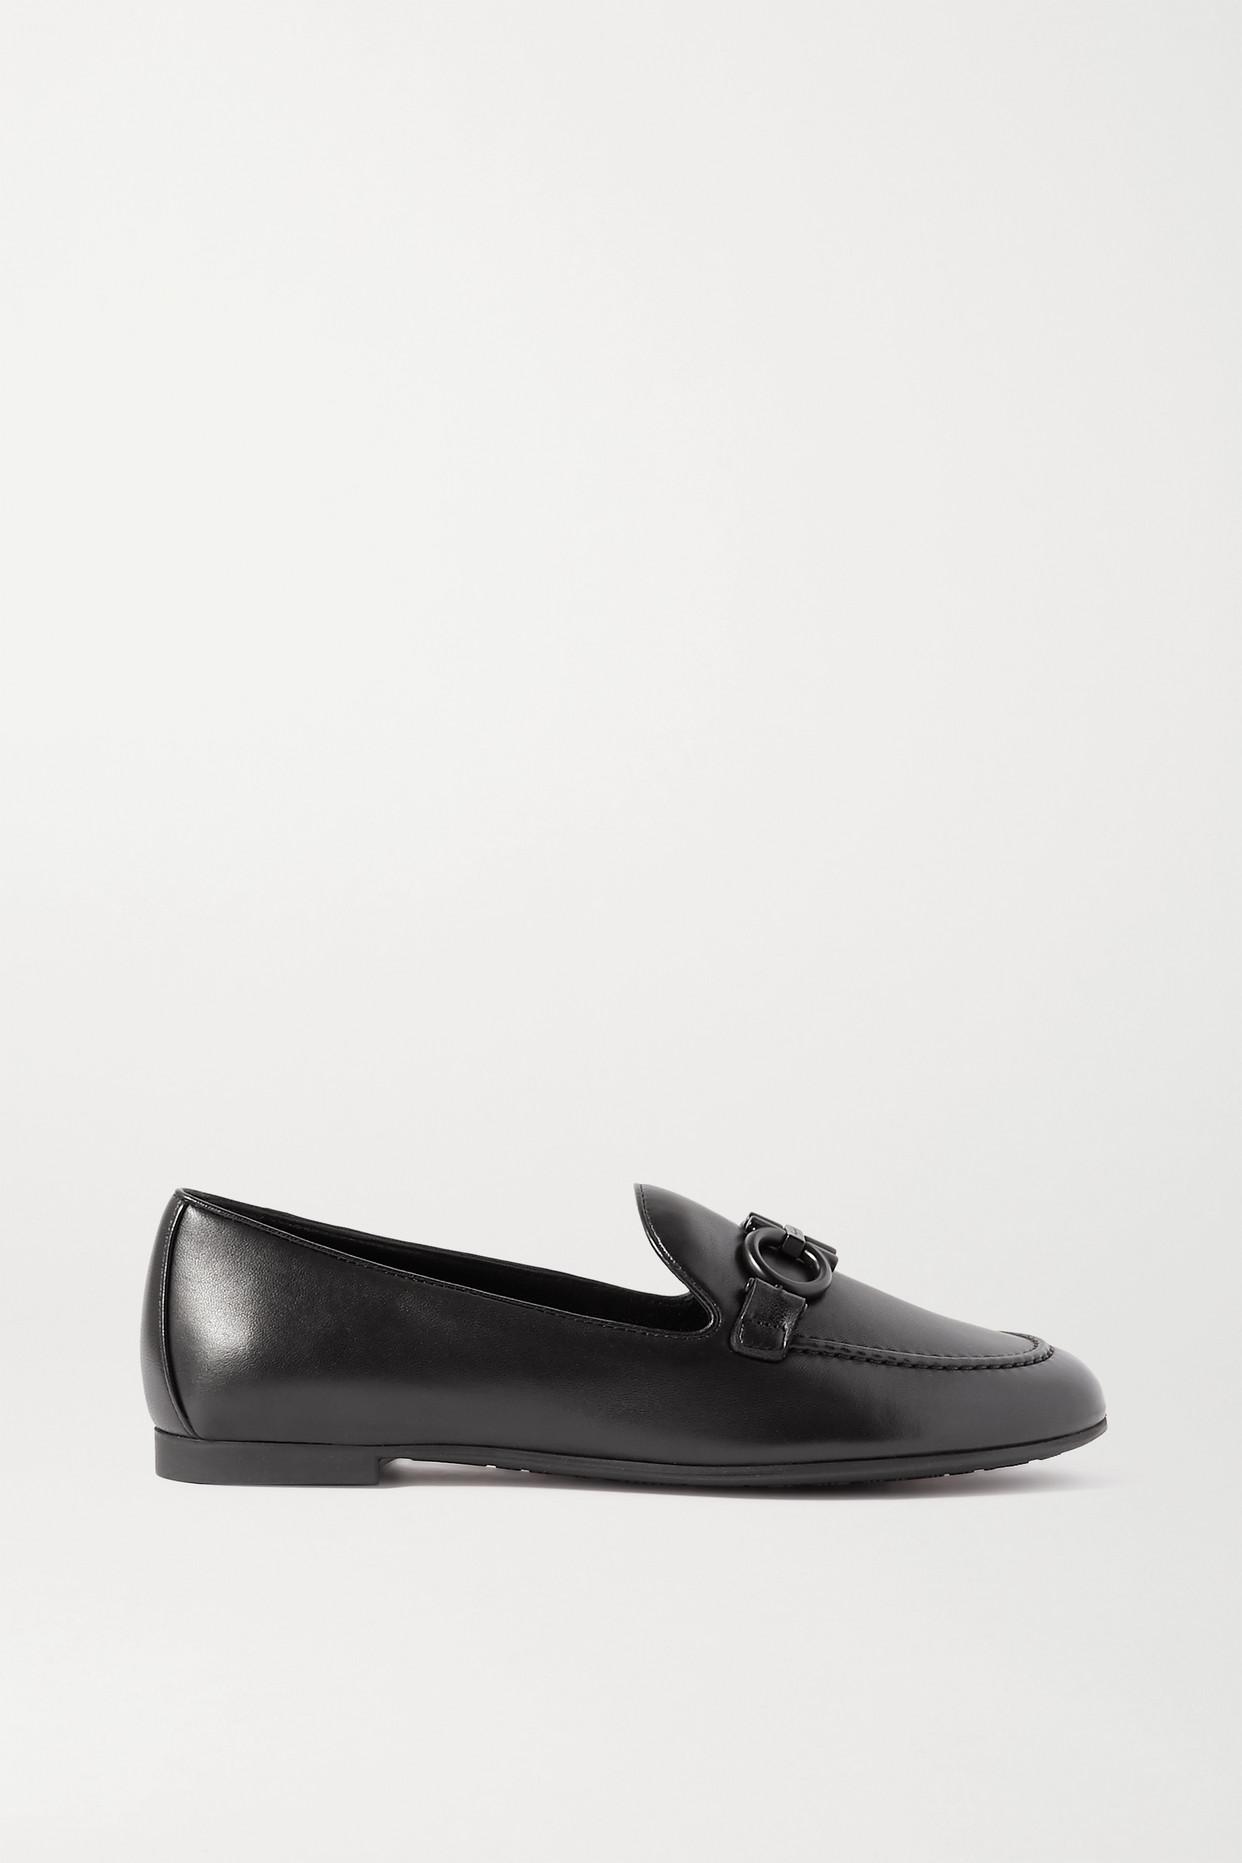 SALVATORE FERRAGAMO - 带缀饰皮革乐福鞋 - 黑色 - US10.5